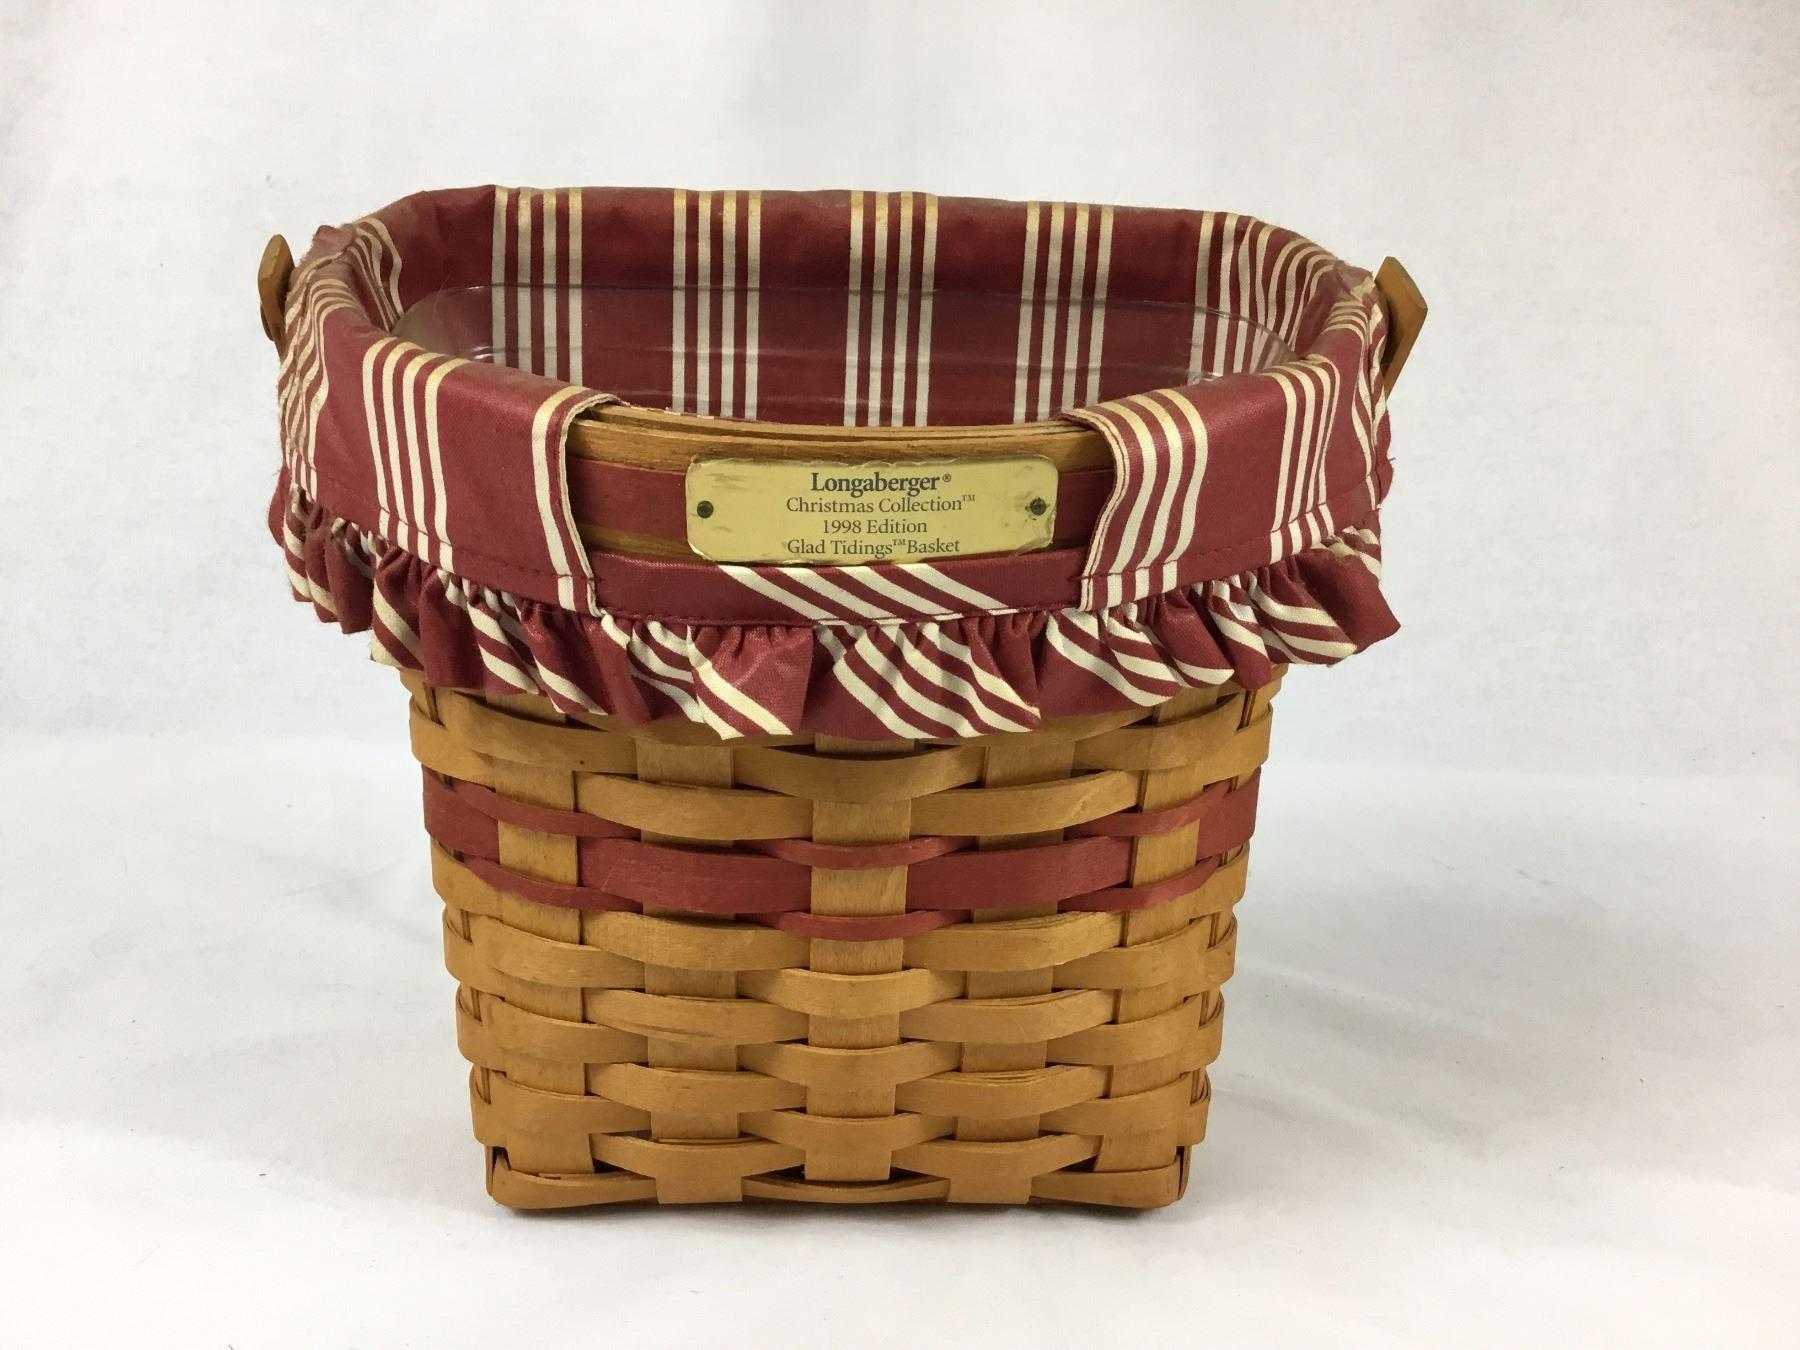 Longaberger Christmas Basket.Longaberger Christmas Collection 1998 Edition Glad Tidings Basket